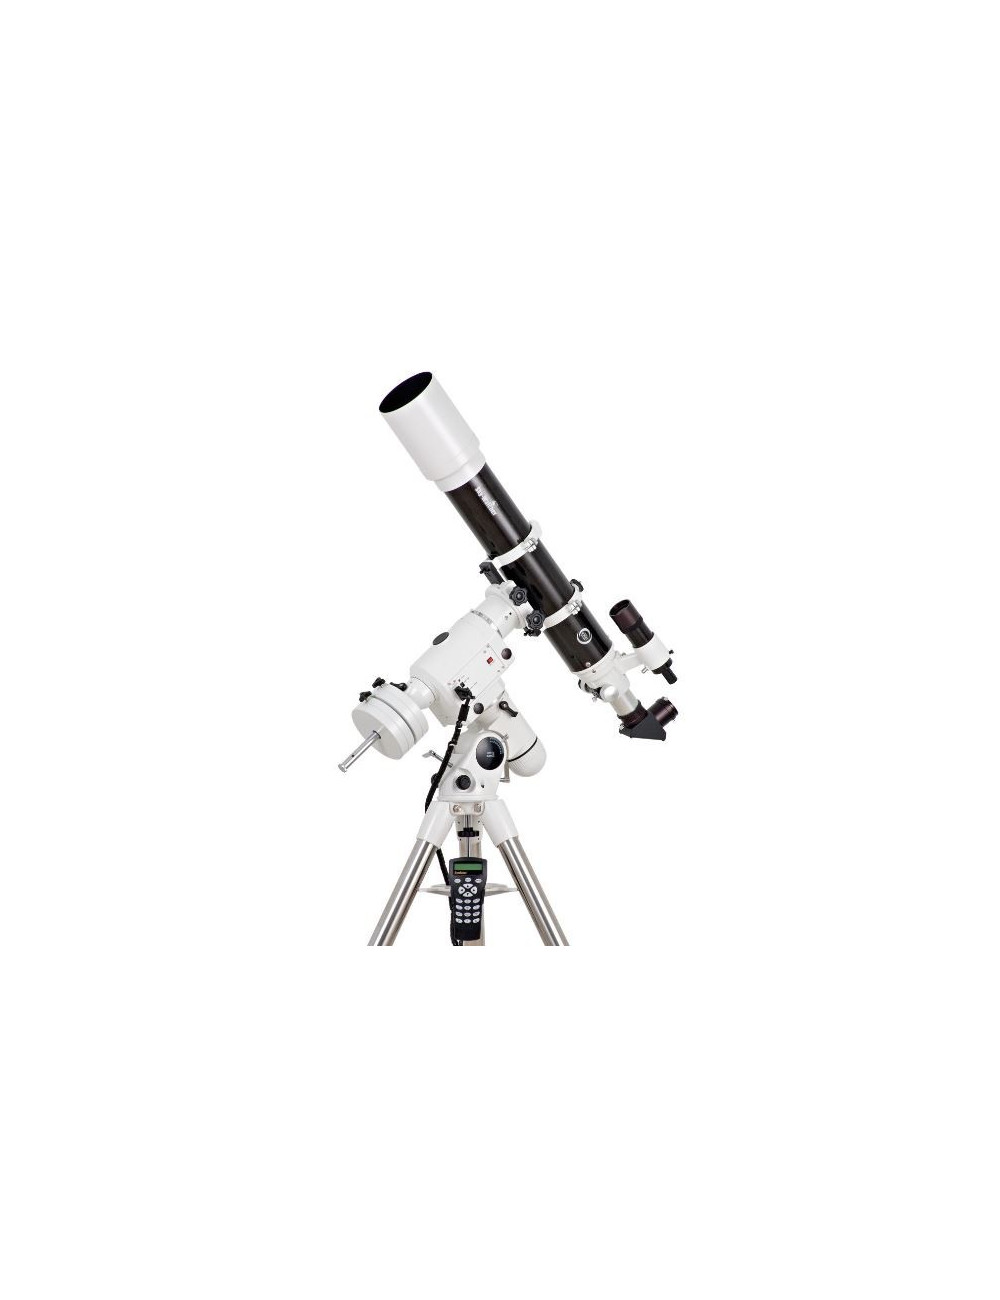 Lunette Sky-Watcher 120ED Black Diamond sur NEQ6 Pro Go-To